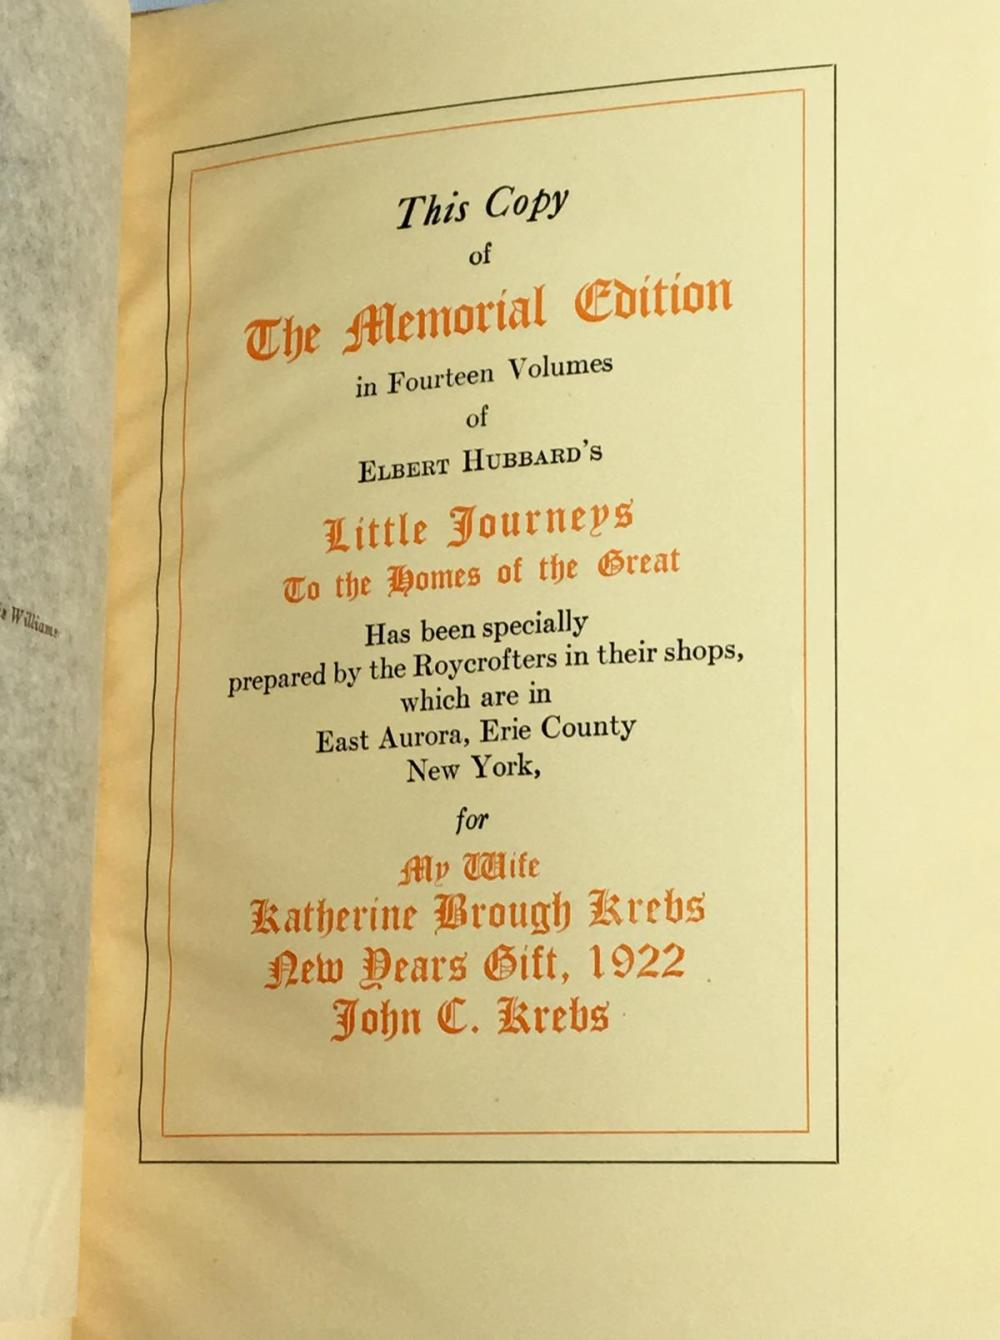 1922 Little Journey's Selected Writings of Elbert Hubbard Memorial Edition Complete 14 Volume Set